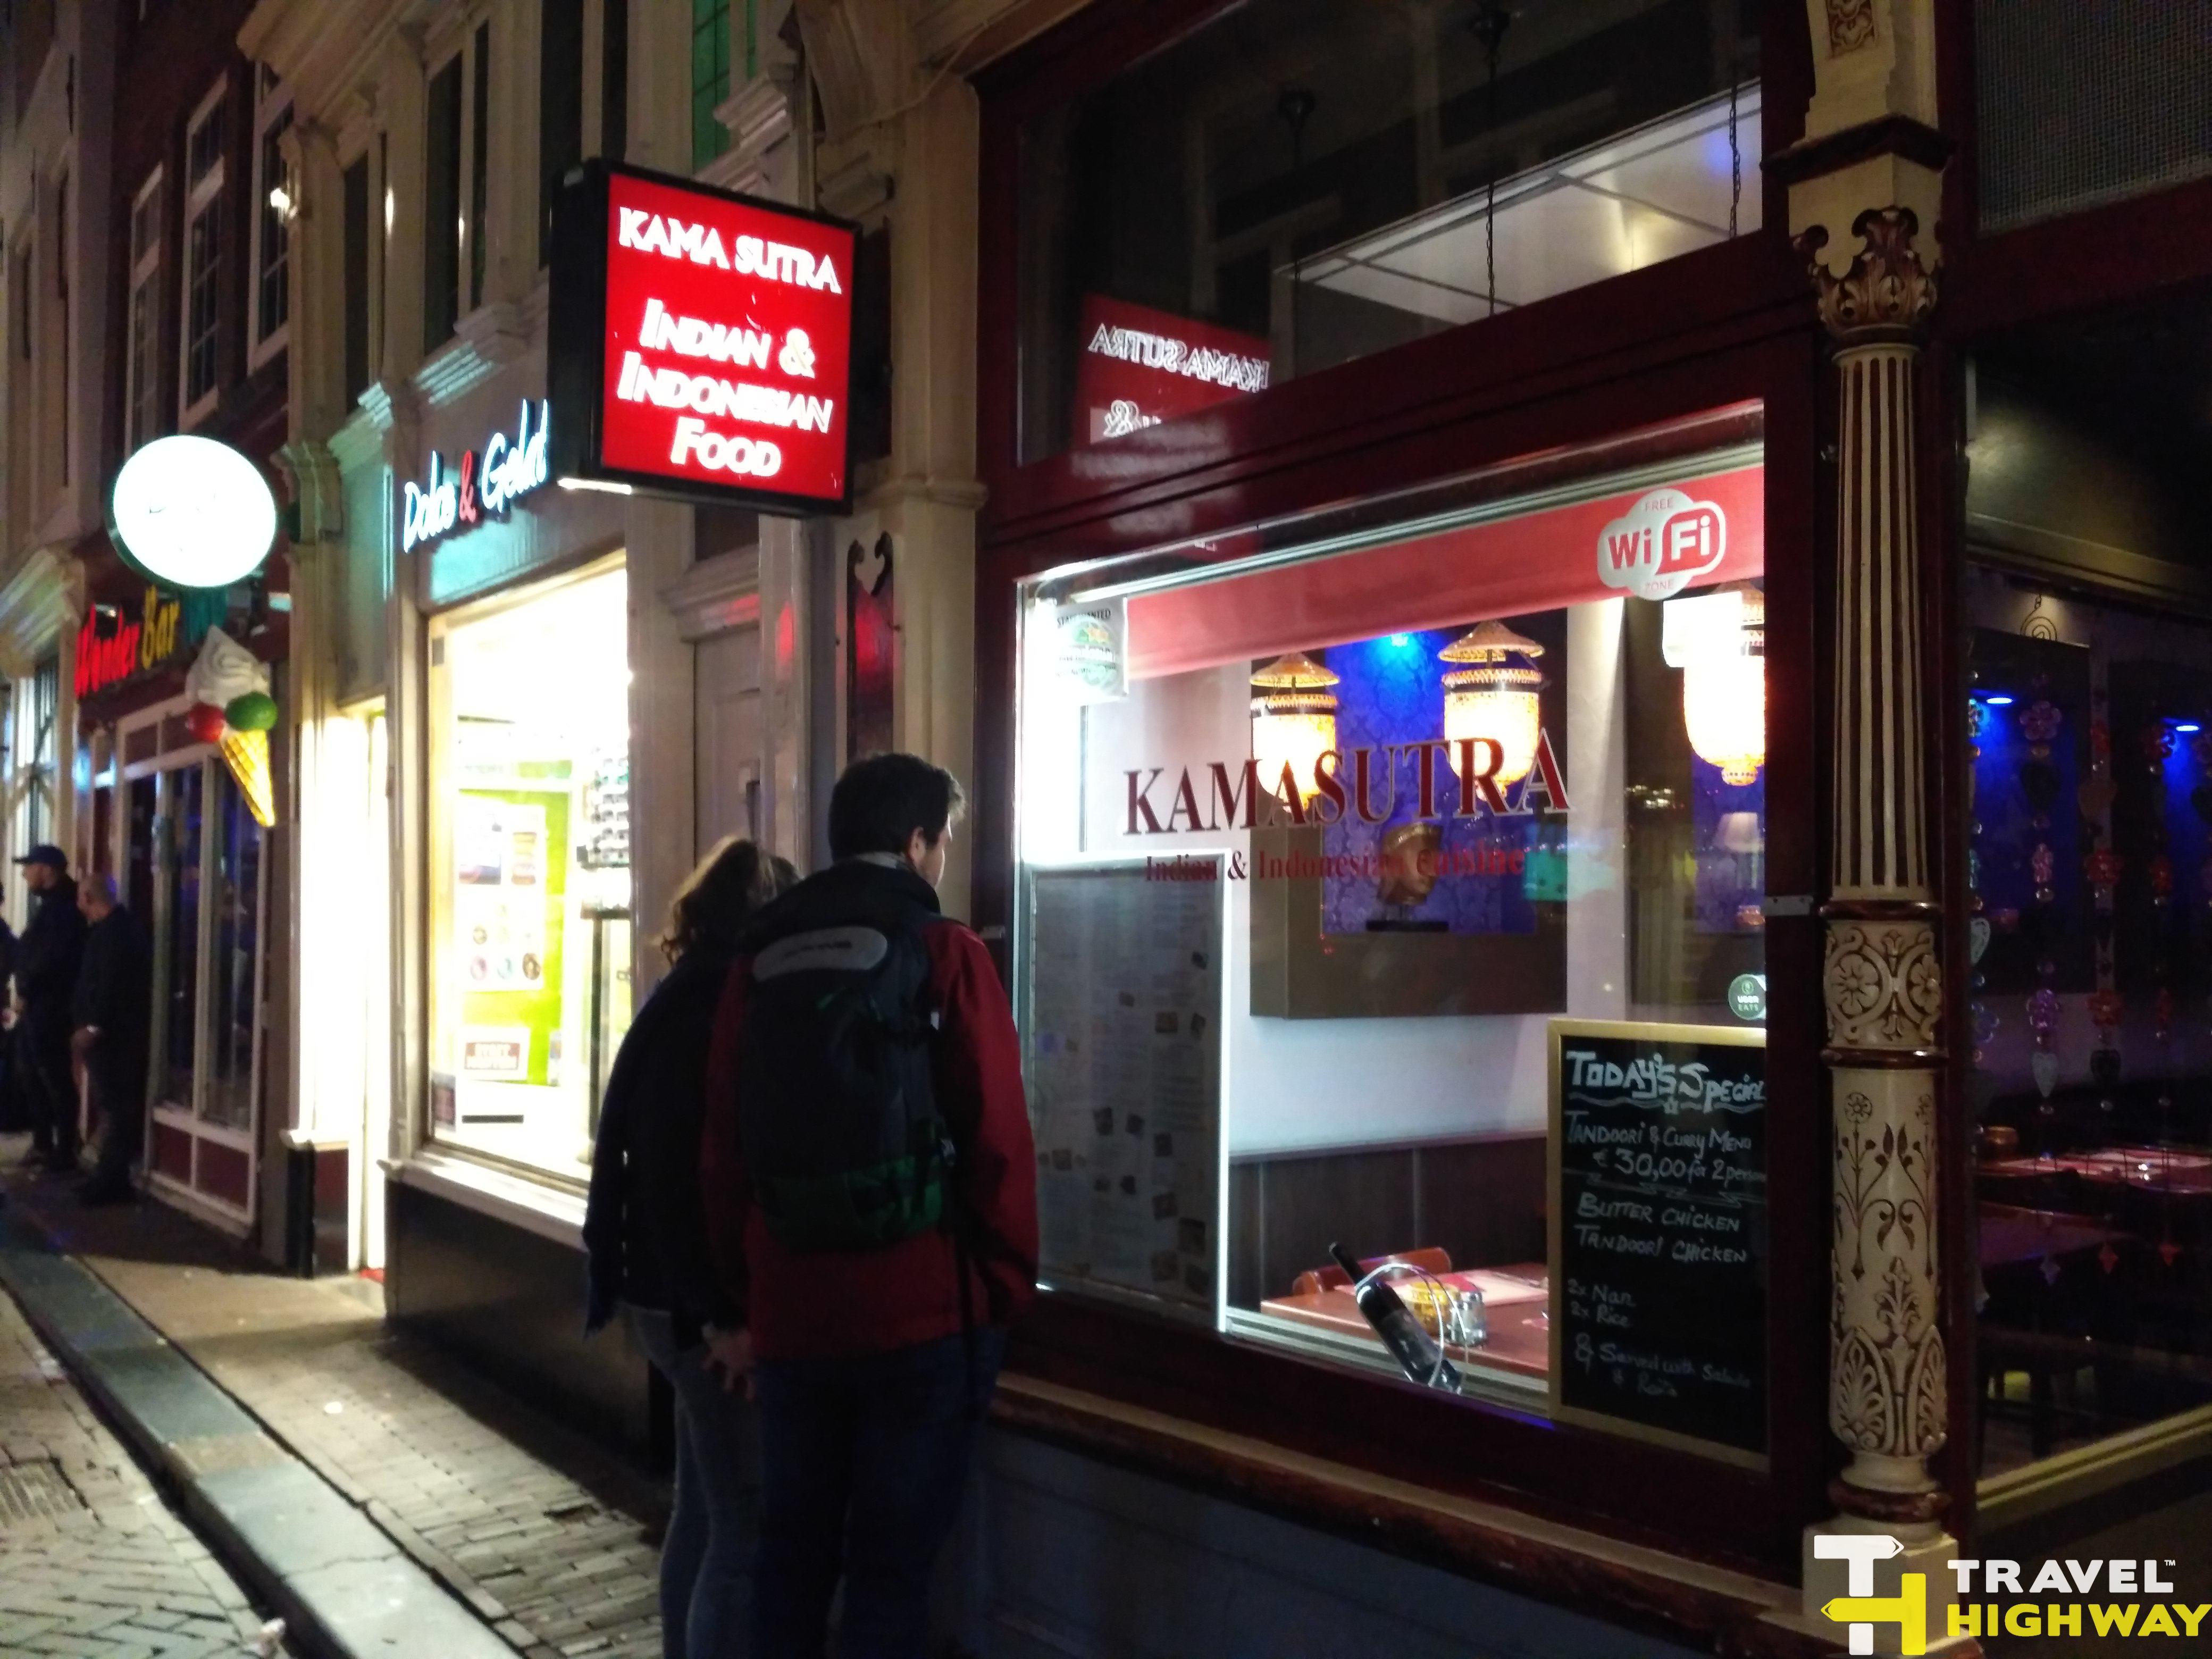 Restaurant Kamasutra Red Light District